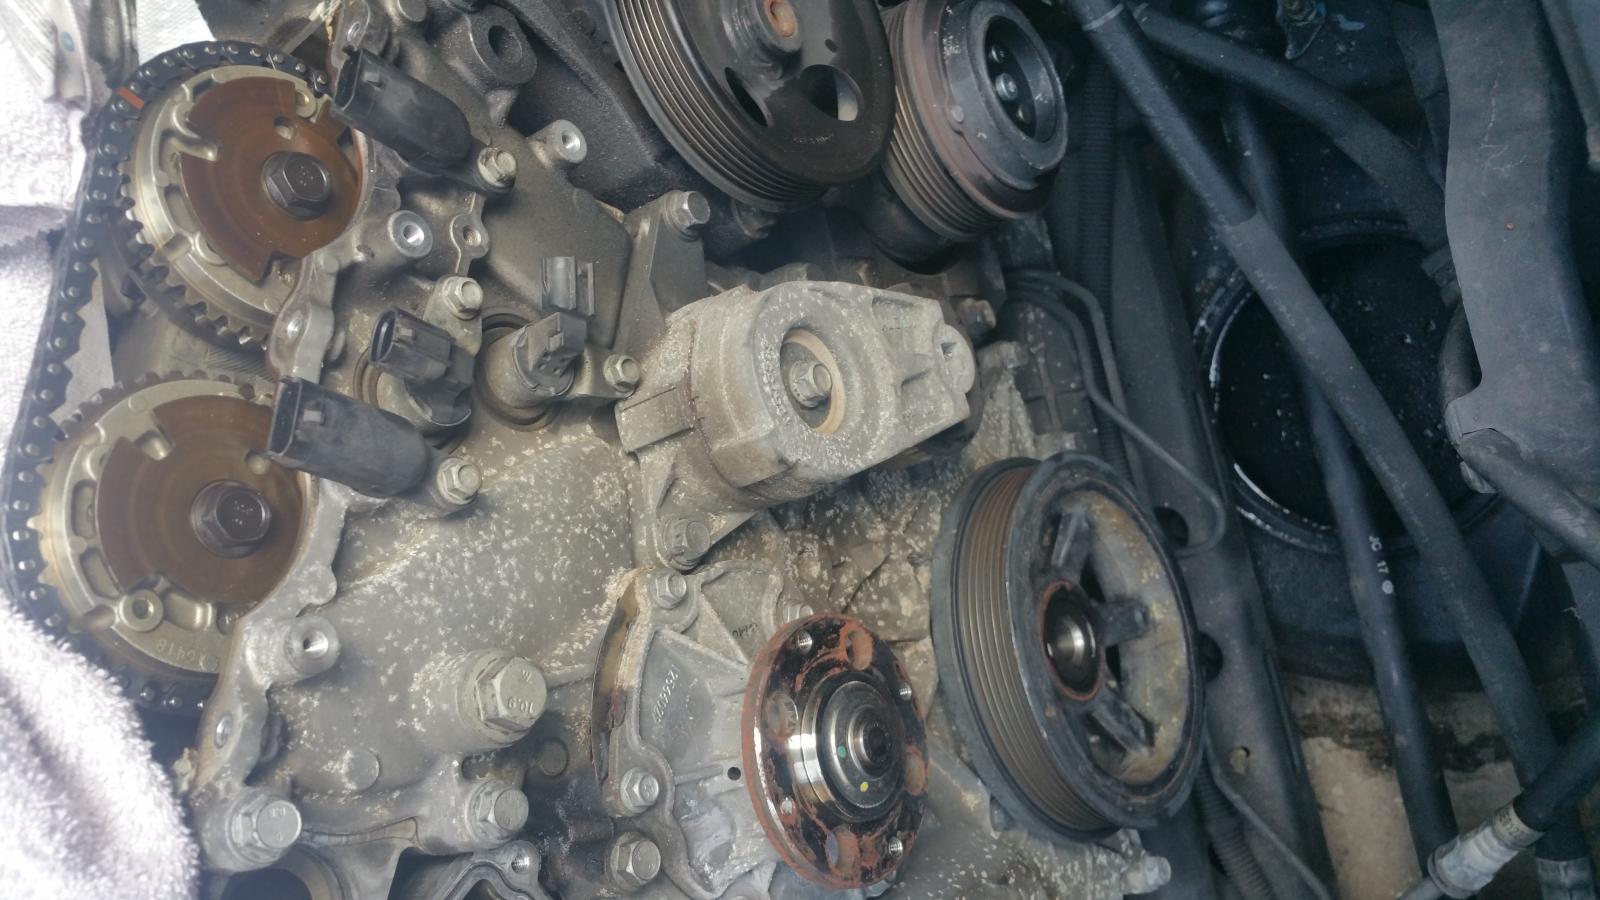 2010 Chevrolet Camaro 1ls >> 2010 3.6l LLT harmonic balancer removal - Camaro5 Chevy ...